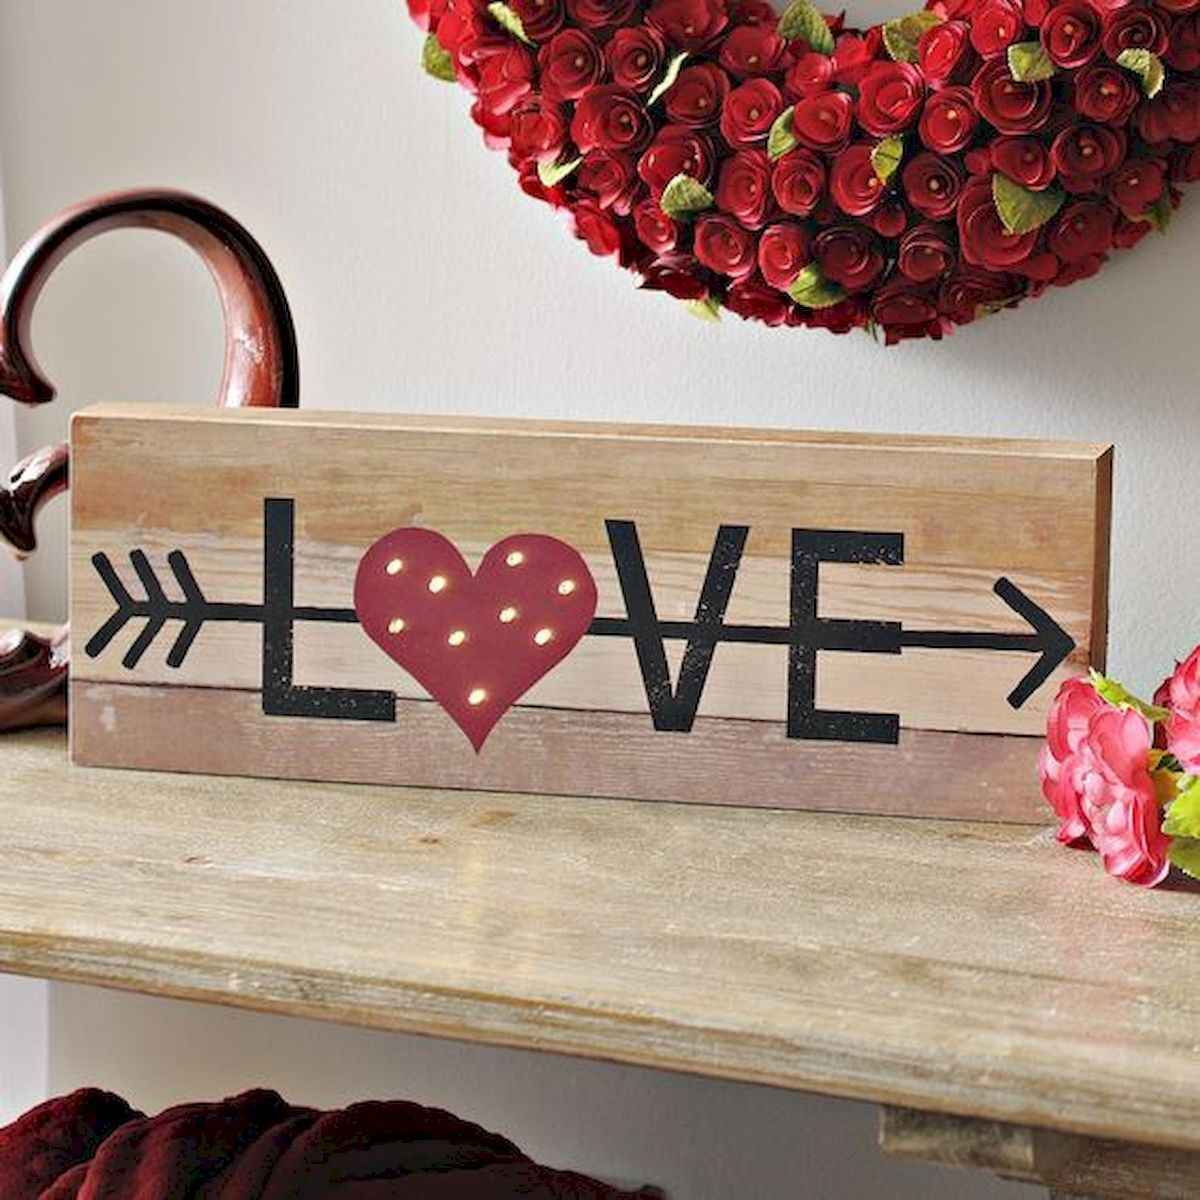 75 Romantic Valentines Day Crafts Design Ideas (38)